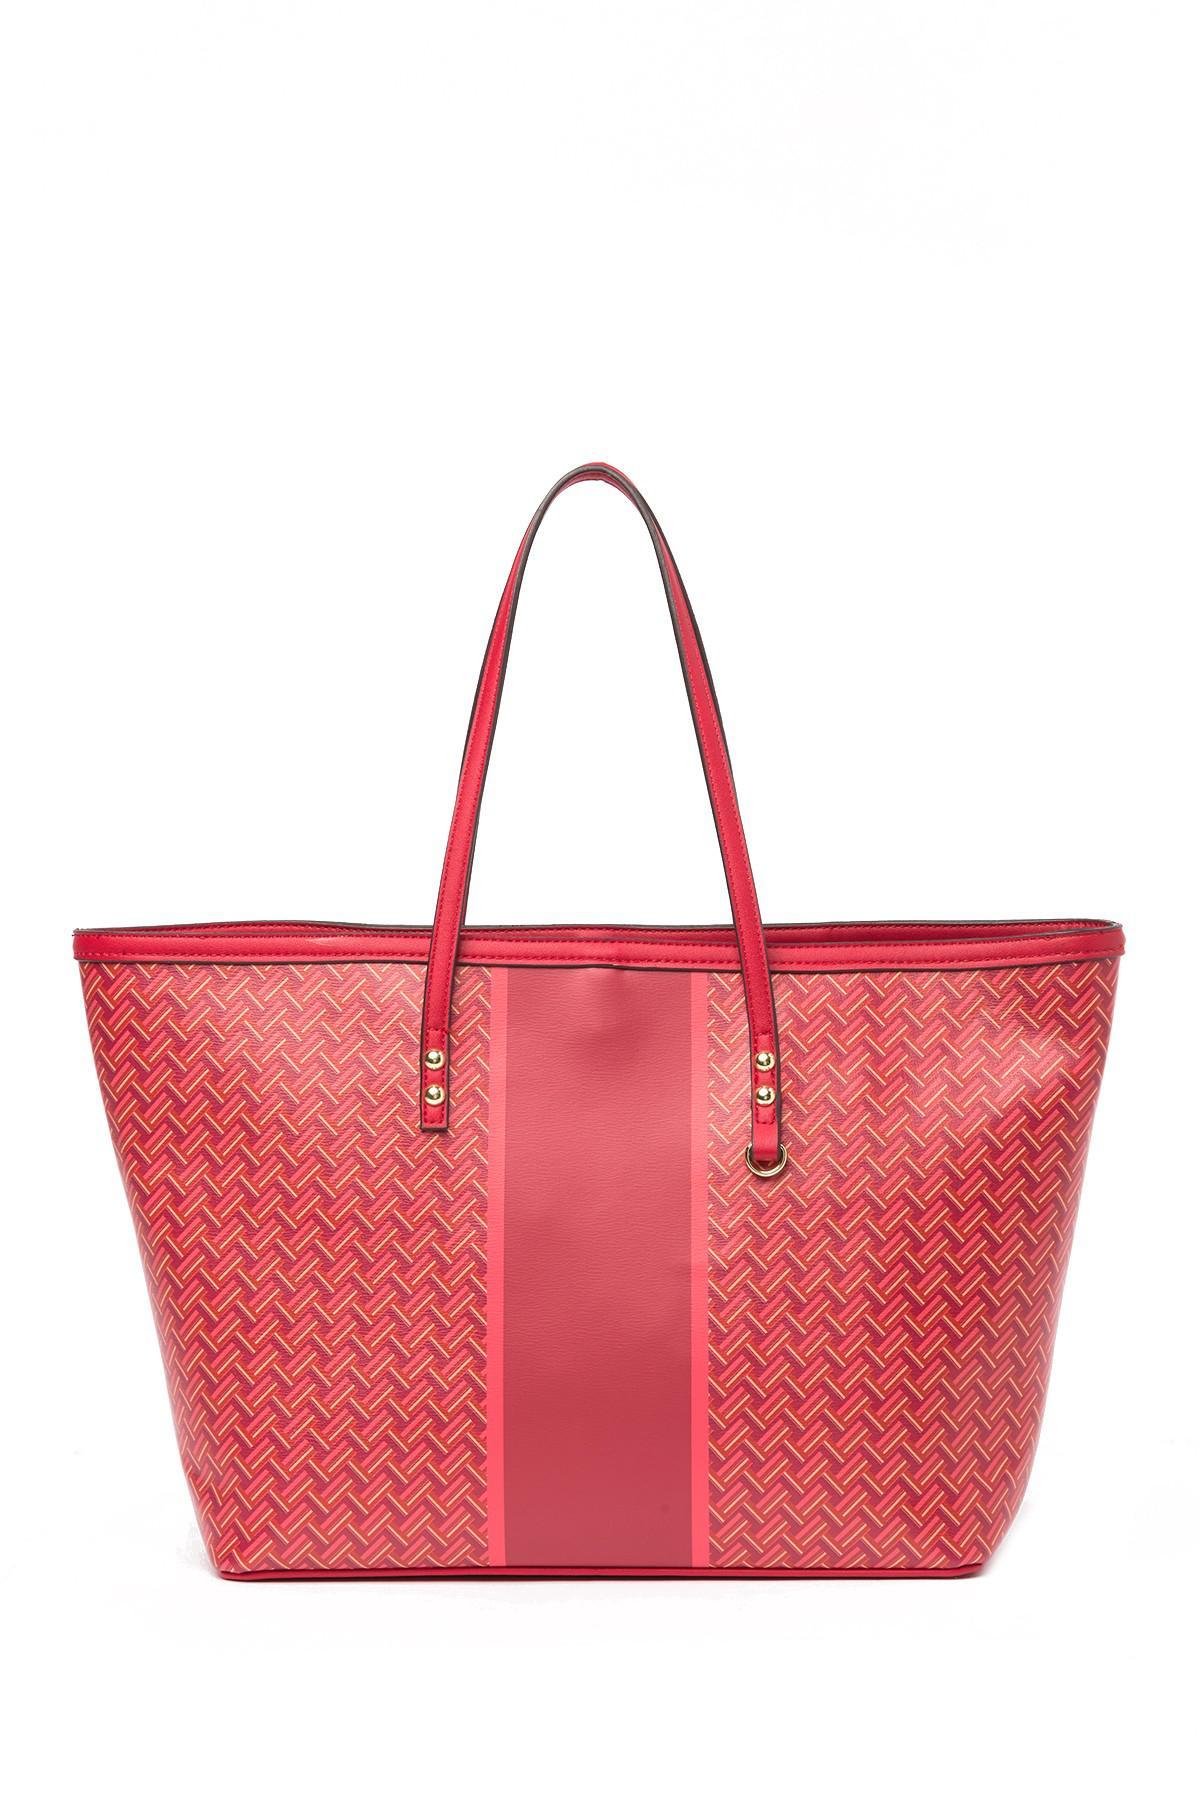 e20b6dfa4ff2 Lyst - Sondra Roberts Printed Tote Bag in Red